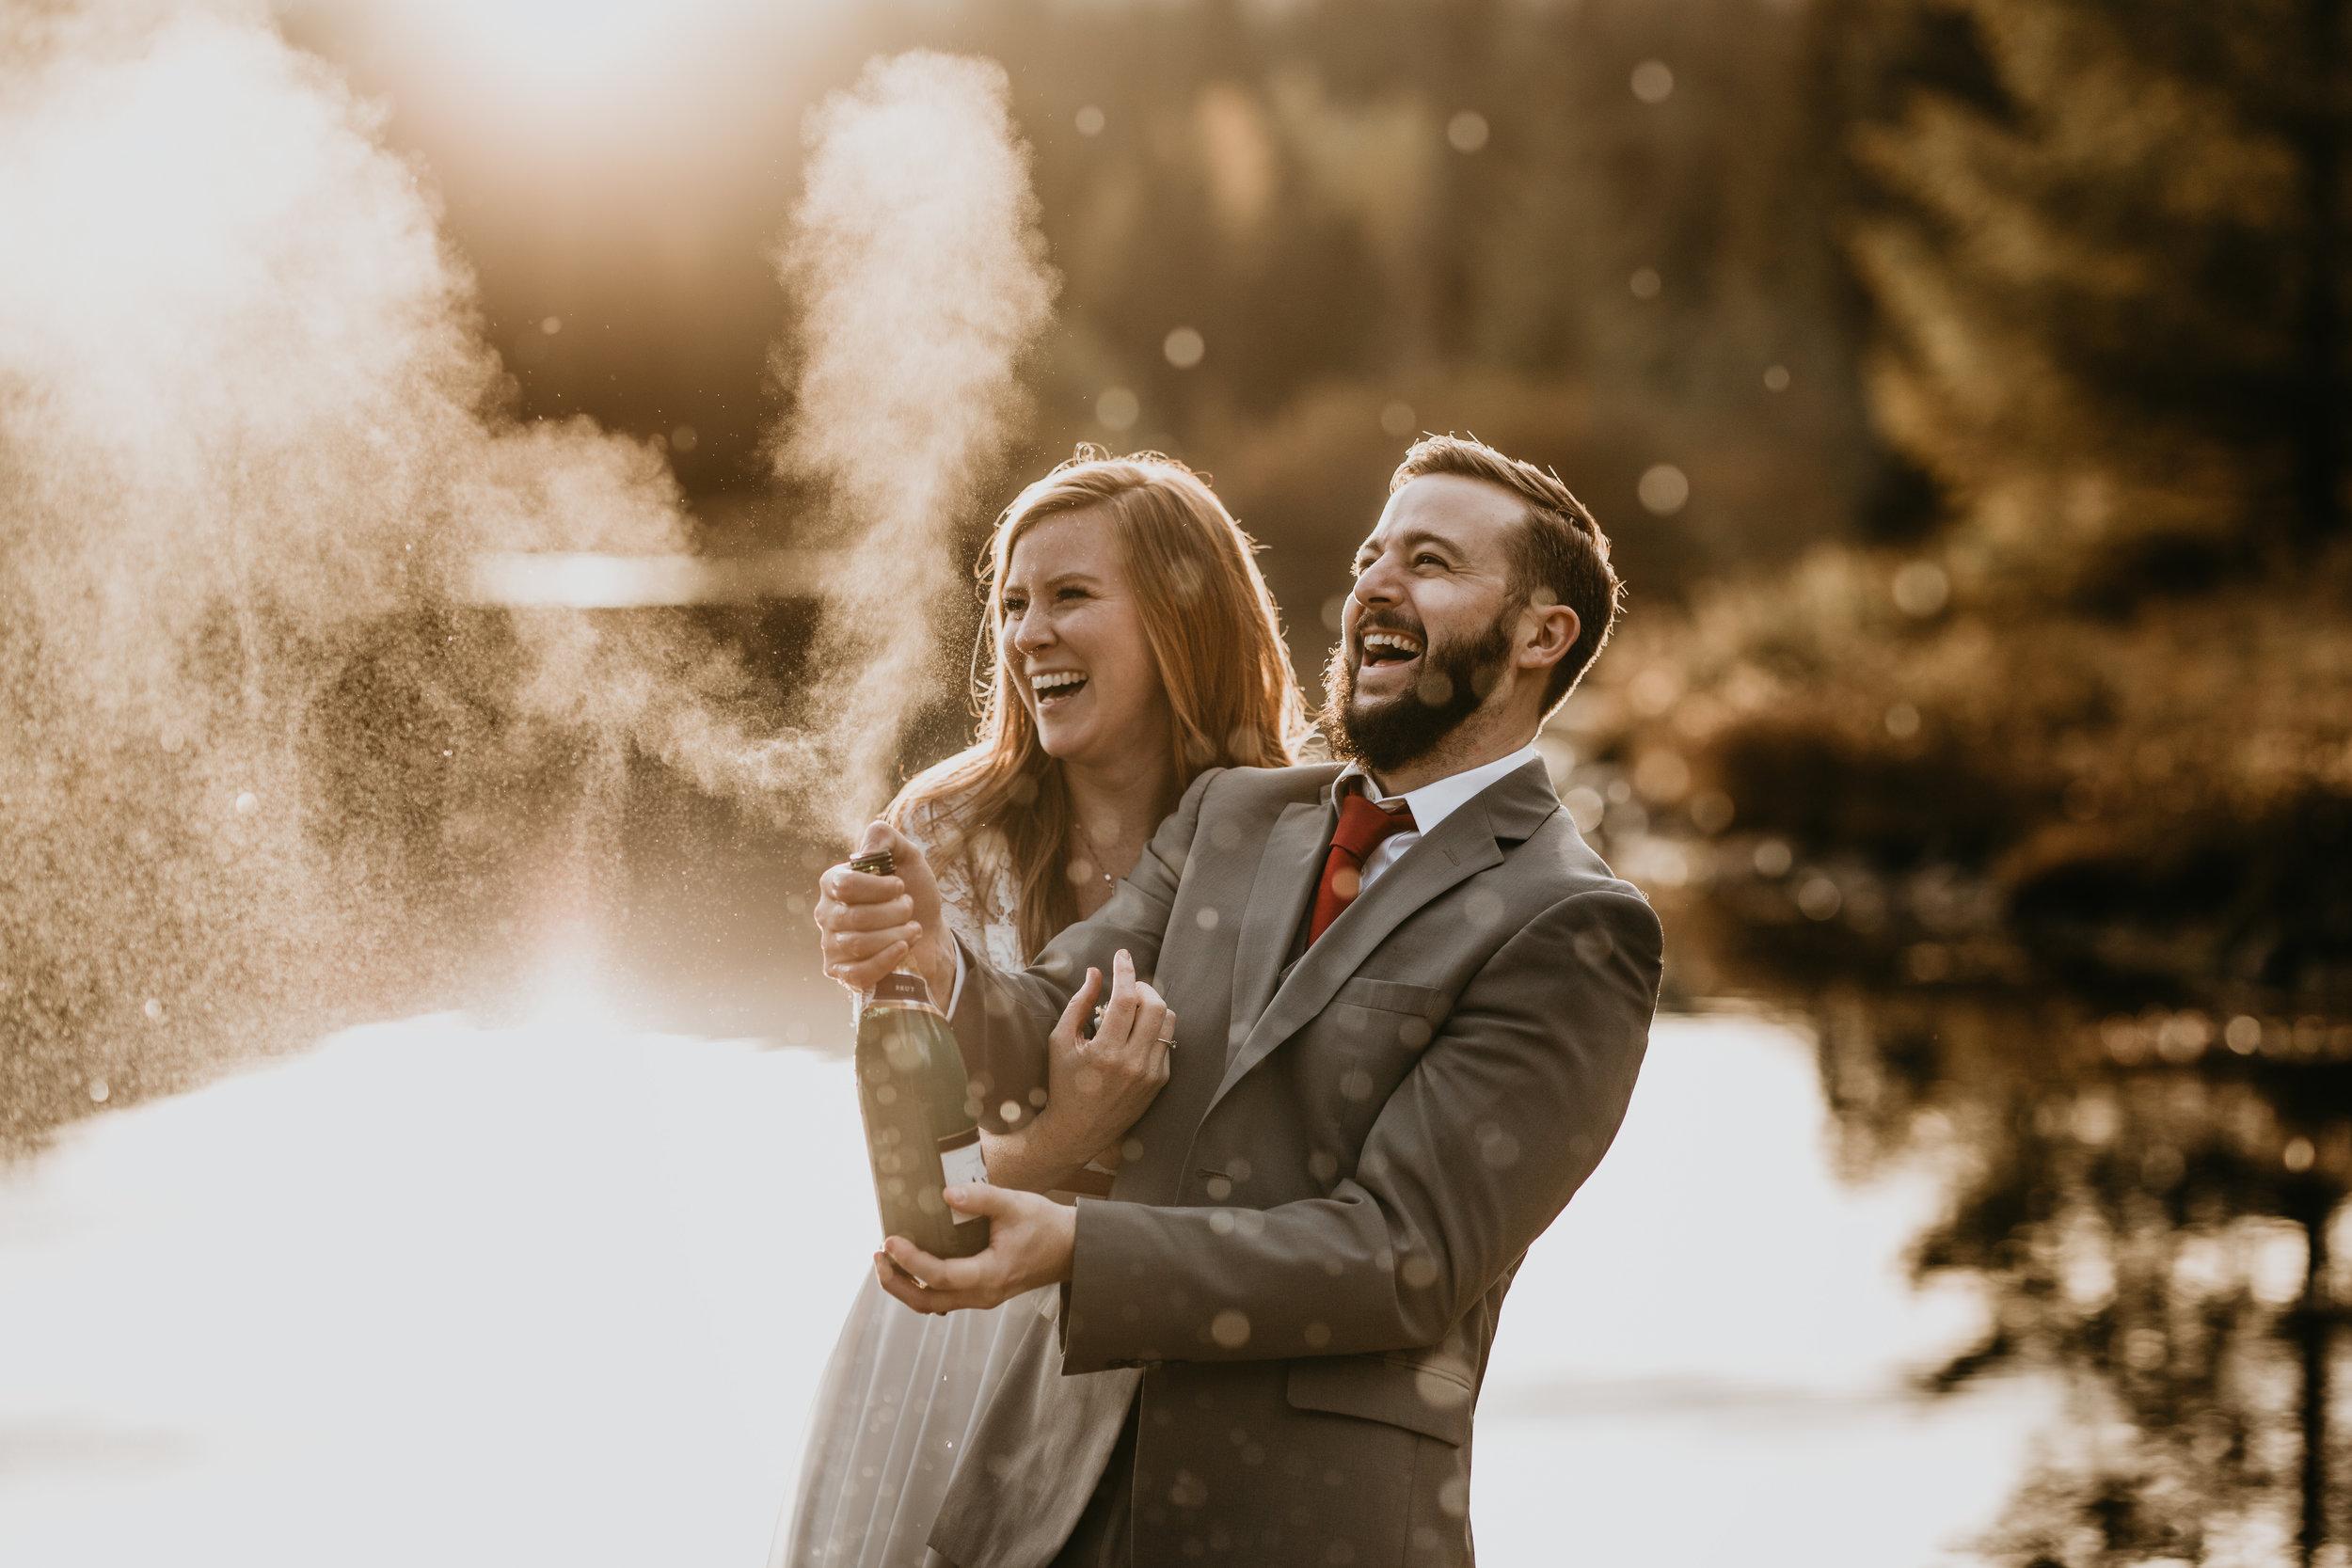 nicole-daacke-photography-mountain-view-elopement-at-gold-creek-pond-snoqualmie-washington-wa-elopement-photographer-photography-adventure-elopement-in-washington-fall-lakeside-golden-sunset-boho-fun-bride-2788.jpg